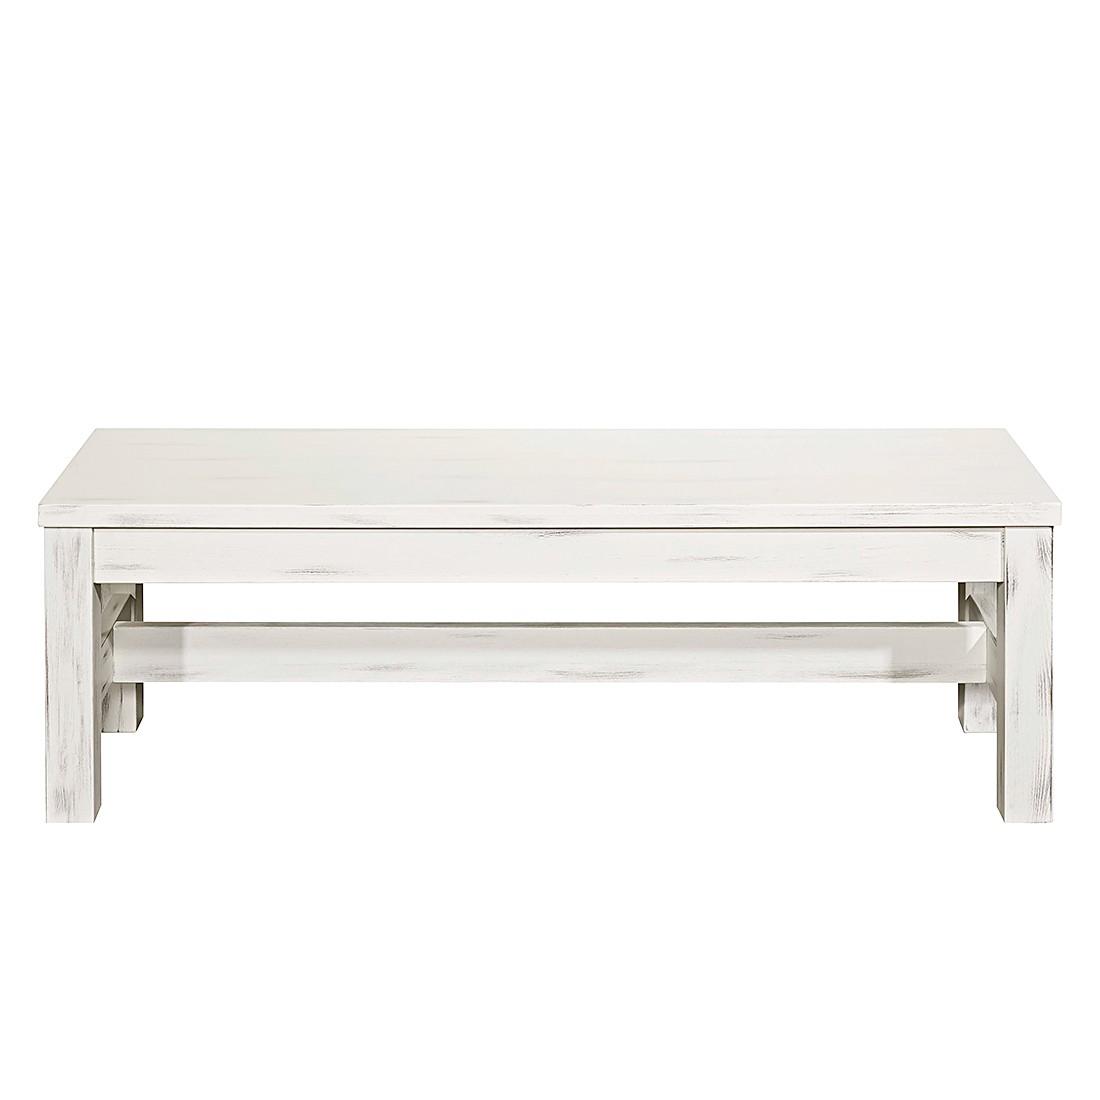 Sitzbank Prado – Kiefer massiv – Vintage Weiß, LMIE jetzt kaufen